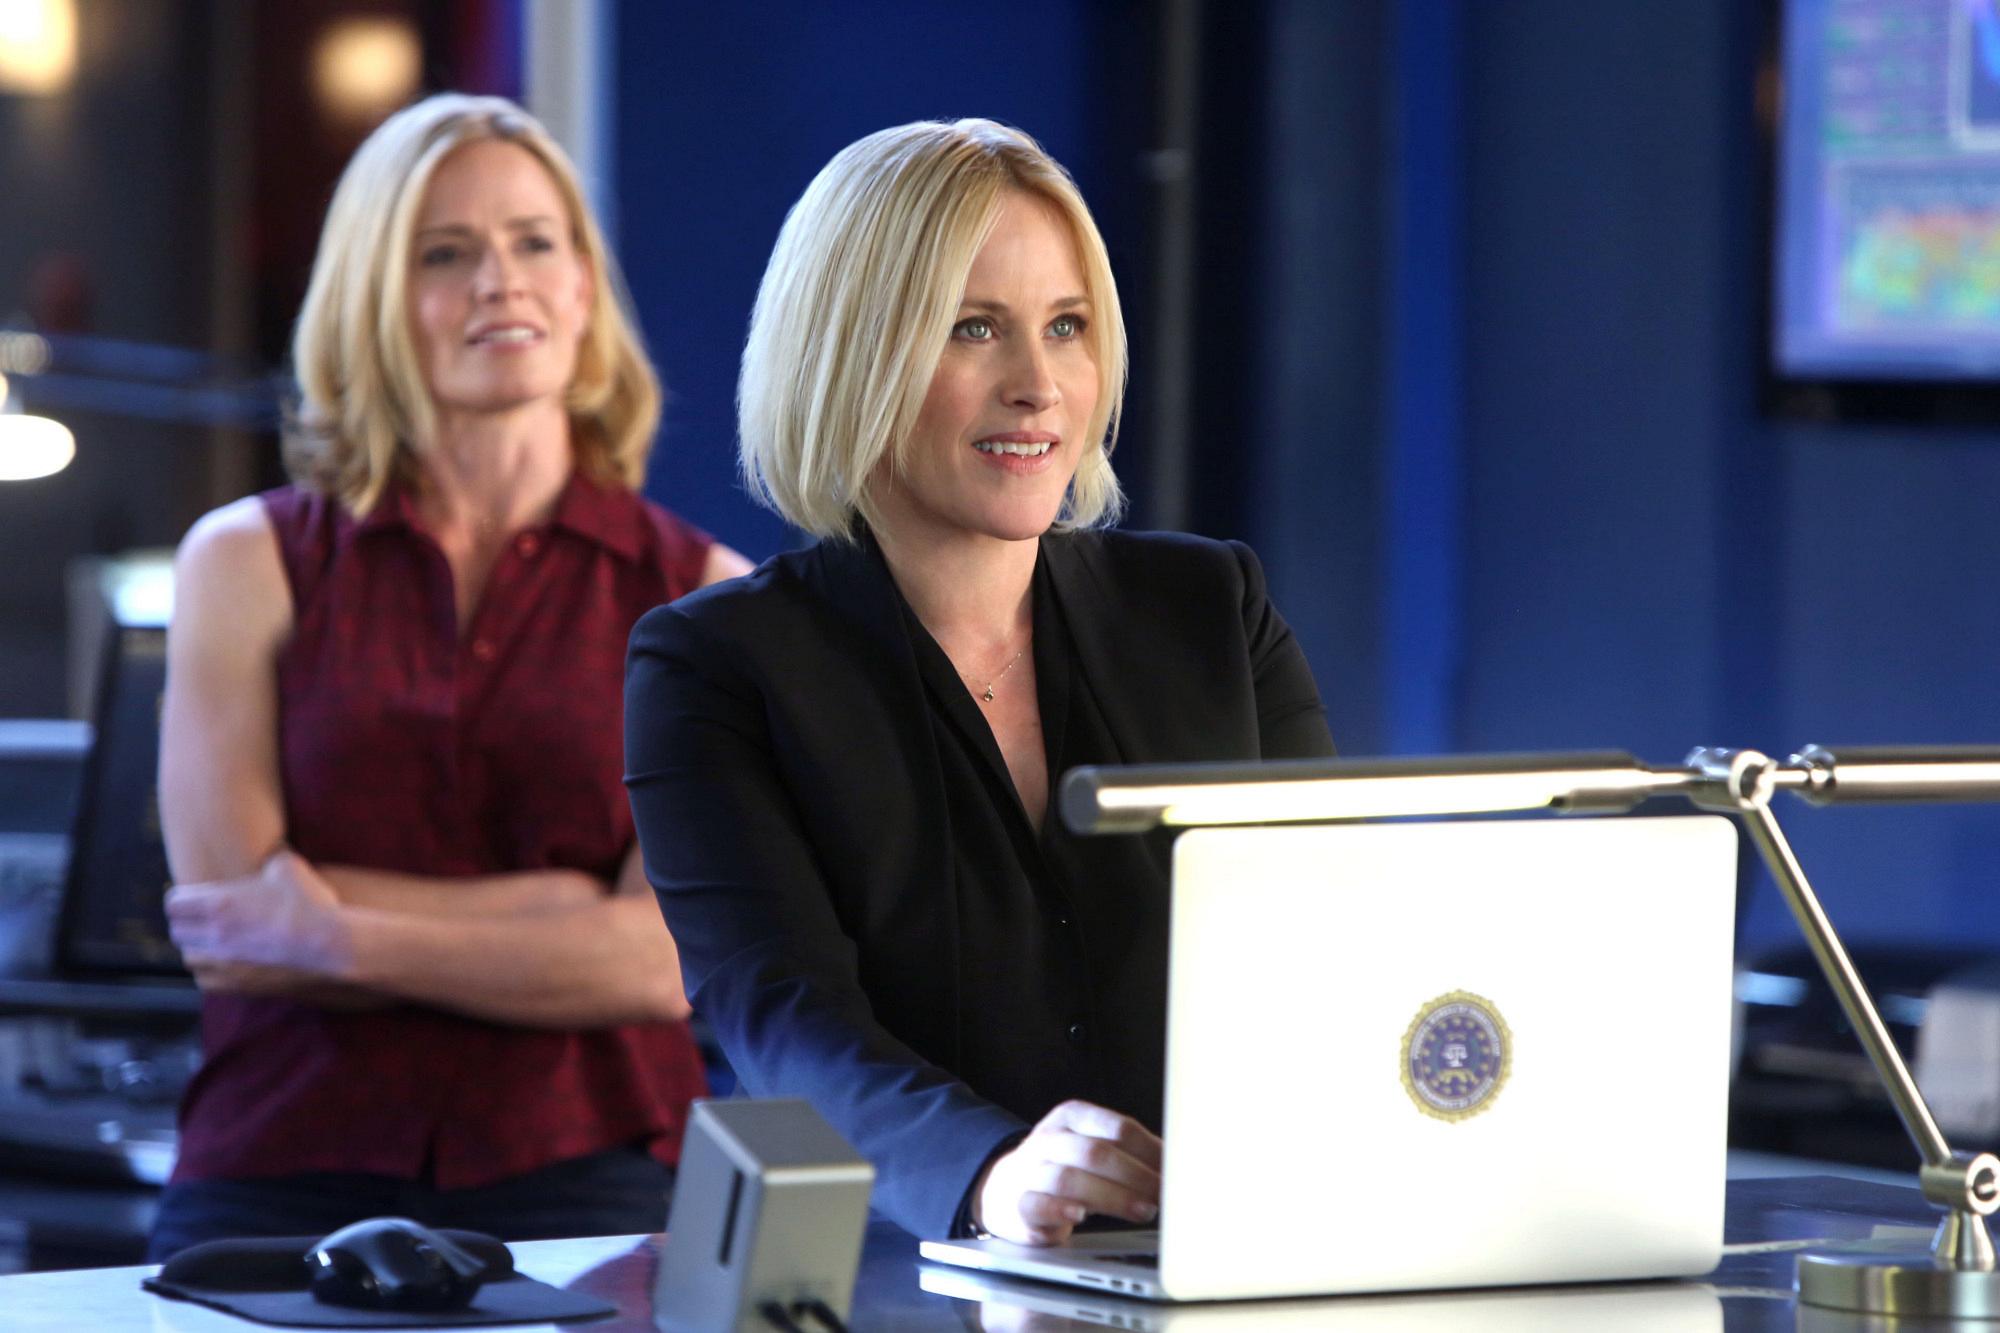 Season 14 Episode 21 Photos - CSI: Crime Scene Investigation